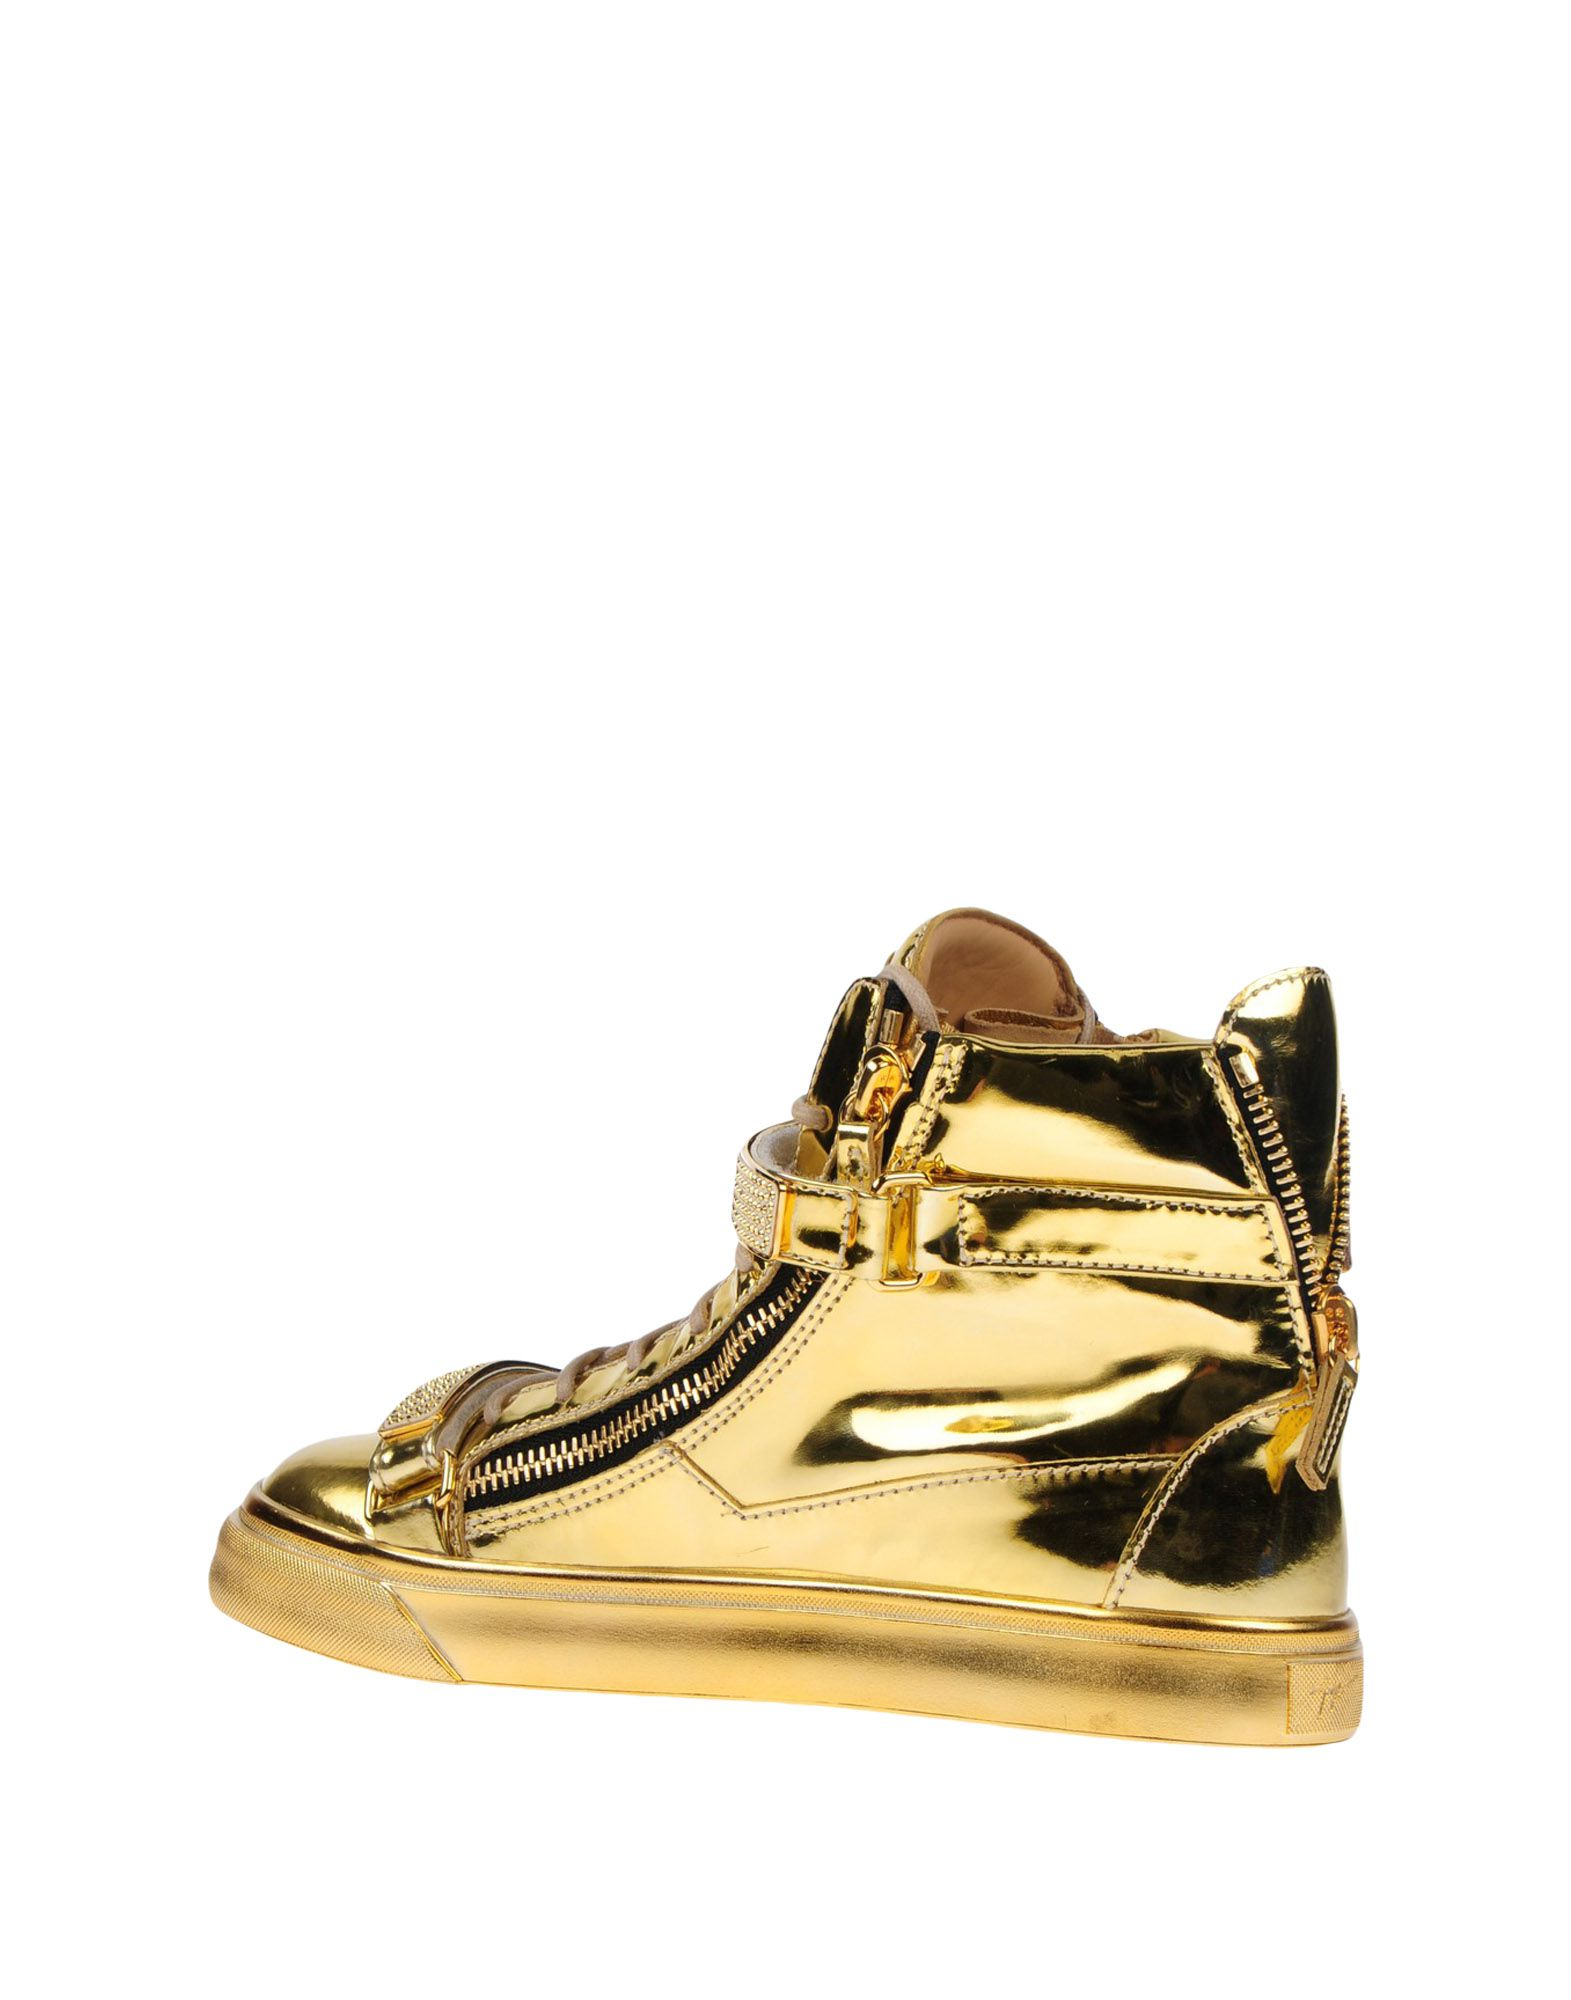 Giuseppe Zanotti Sneakers Damen  Schuhe 11427885TS Beliebte Schuhe  919096